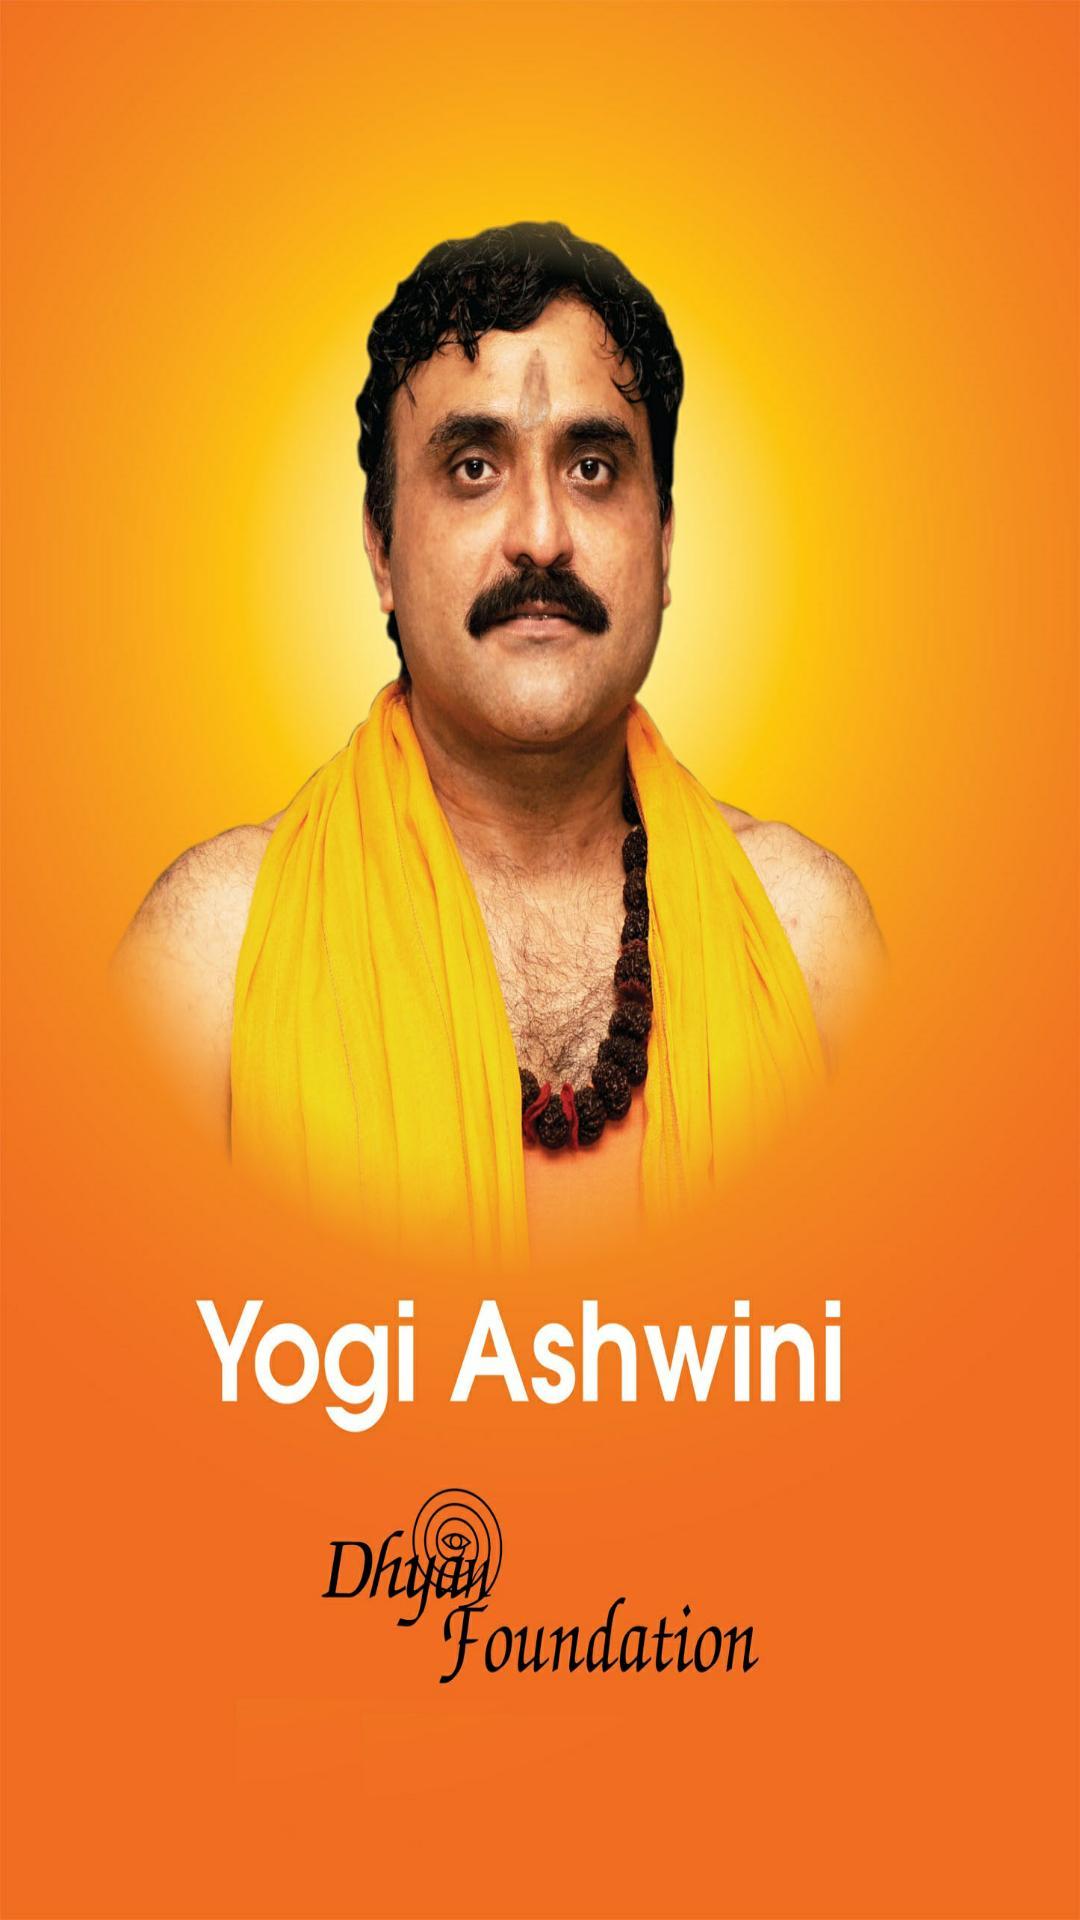 Sanatan Kriya & Vedic Chants by Yogi Ashwini for Android - APK Download